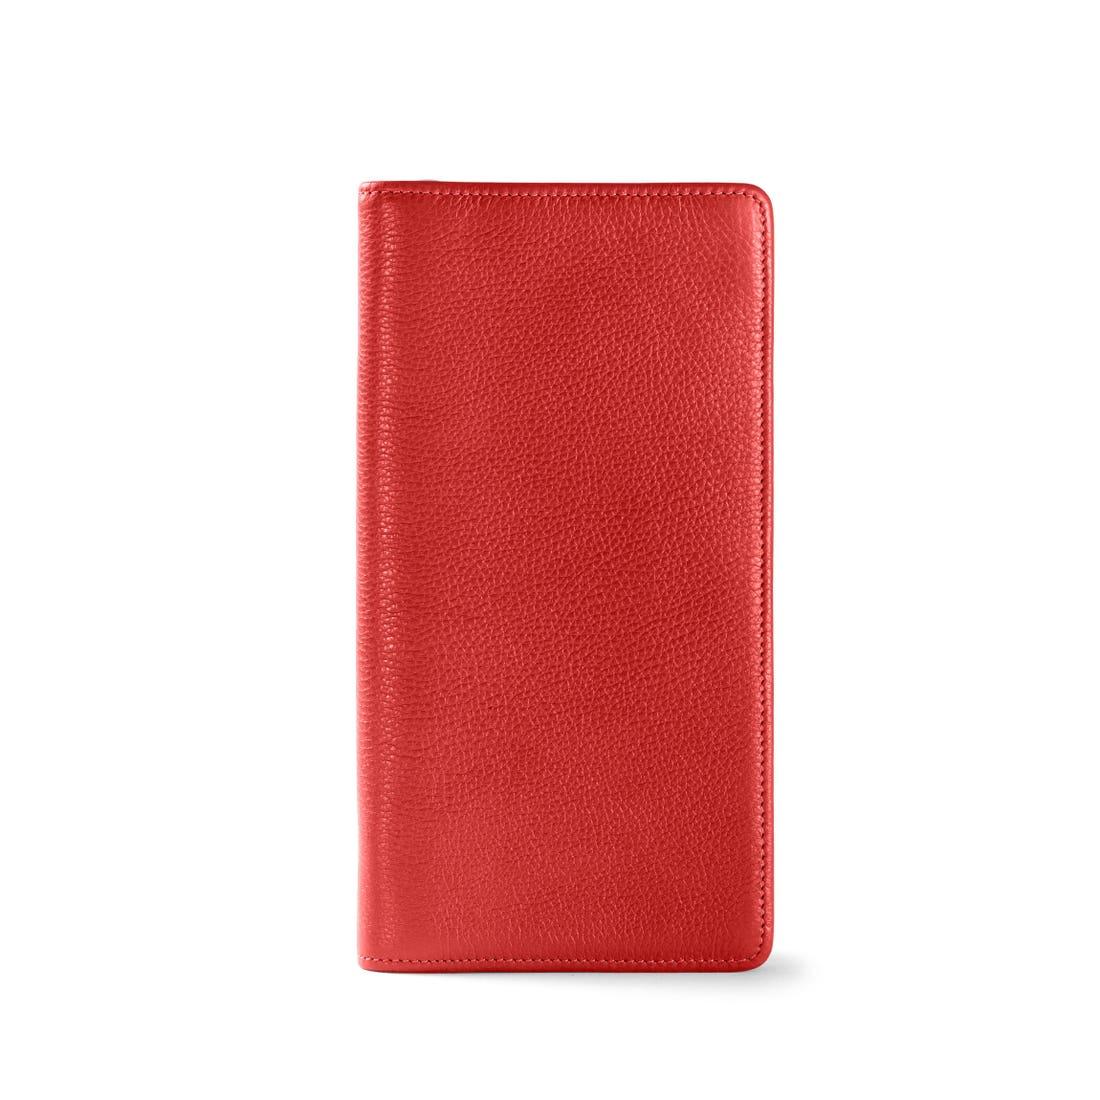 Zip Around Travel Wallet